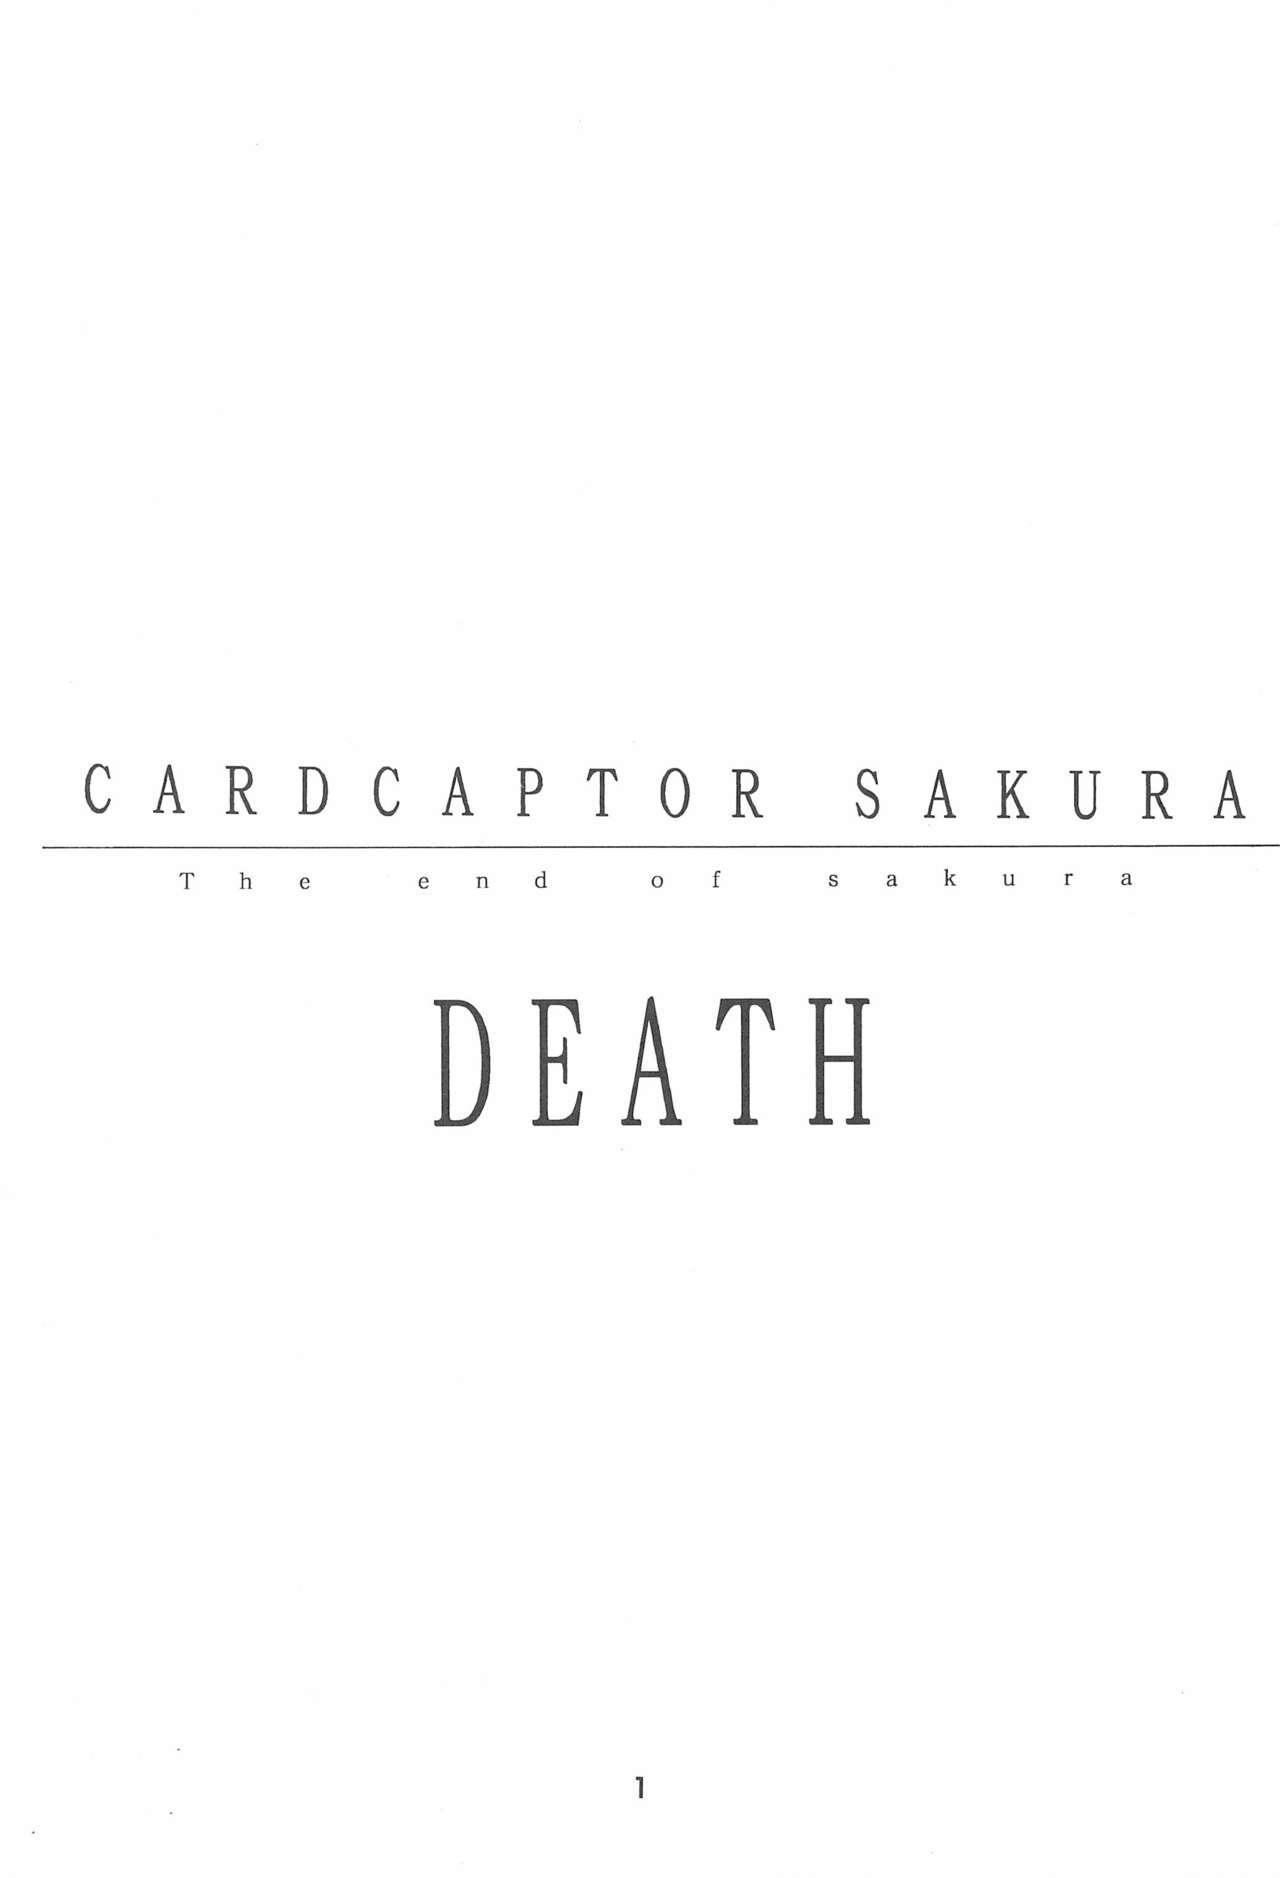 CARDCAPTOR SAKURA DEATH 2